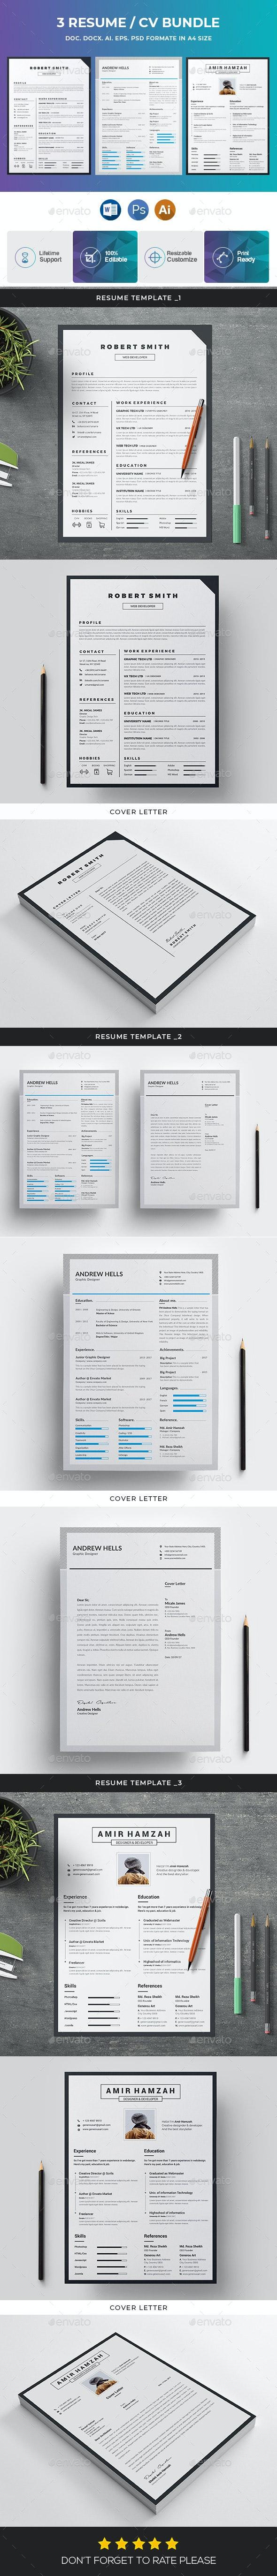 Resume / CV Bundle 3 in 1 - Resumes Stationery